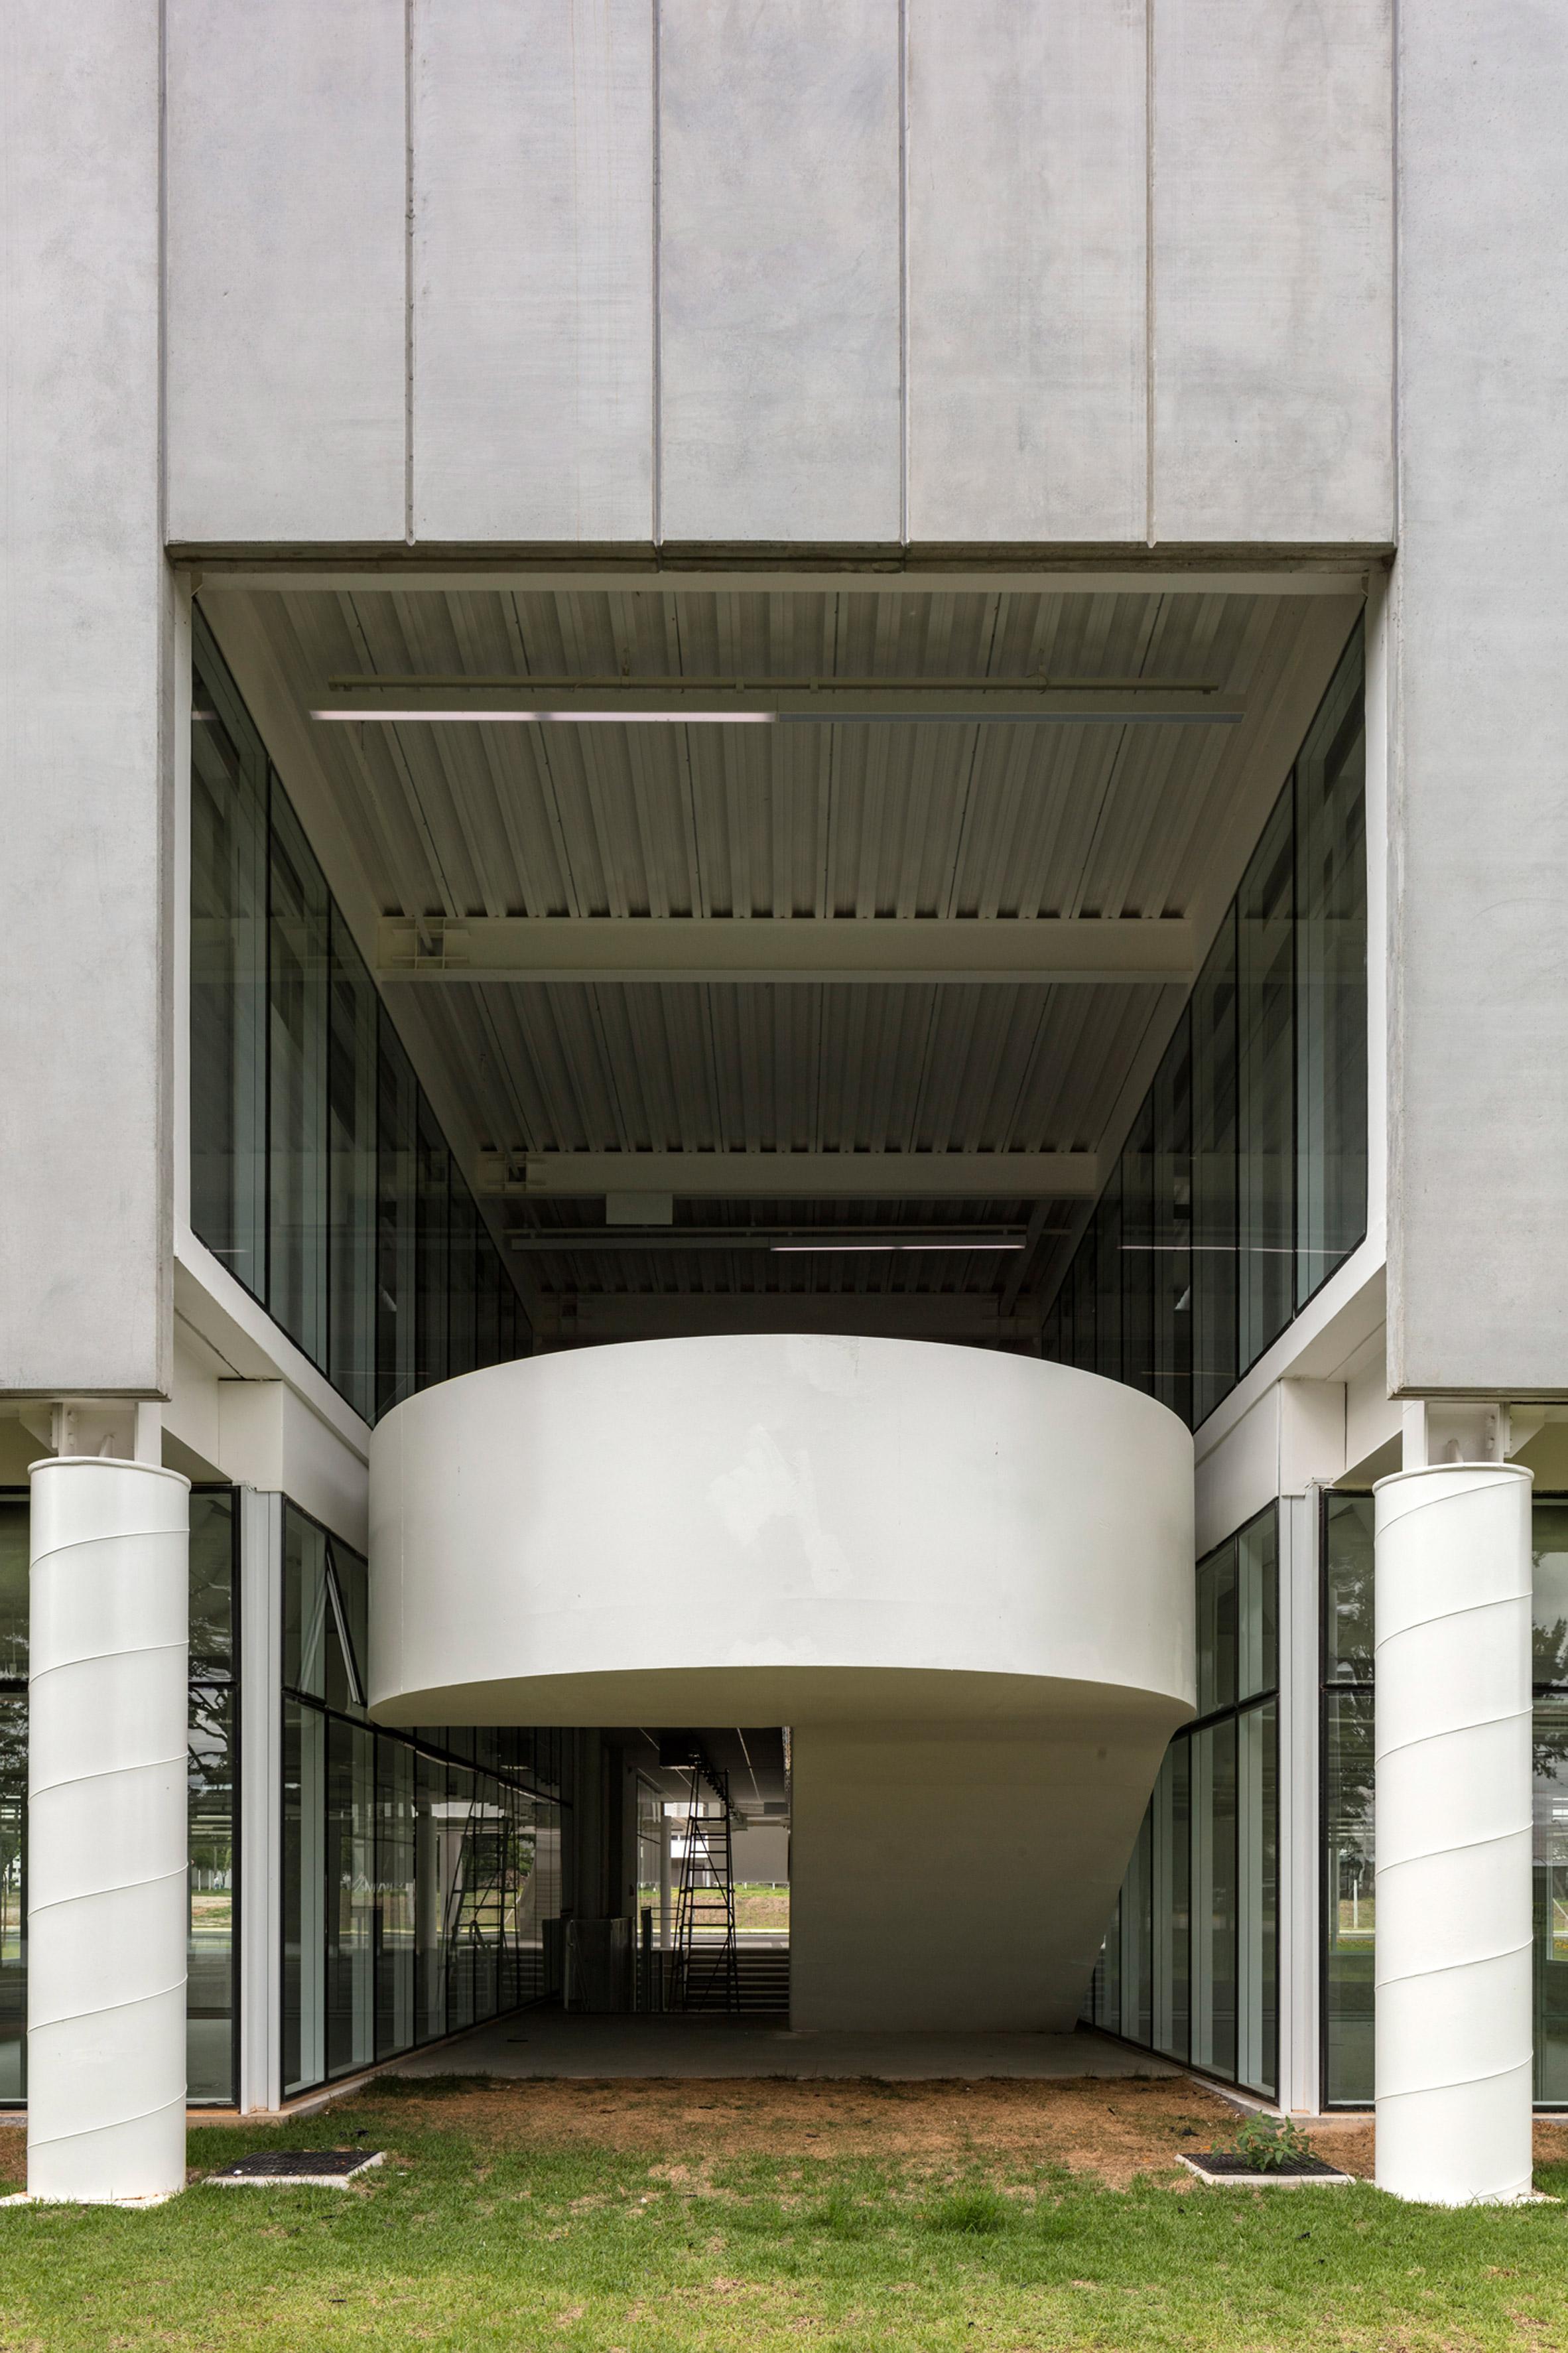 Tech Institute of Aeronautics by Metro